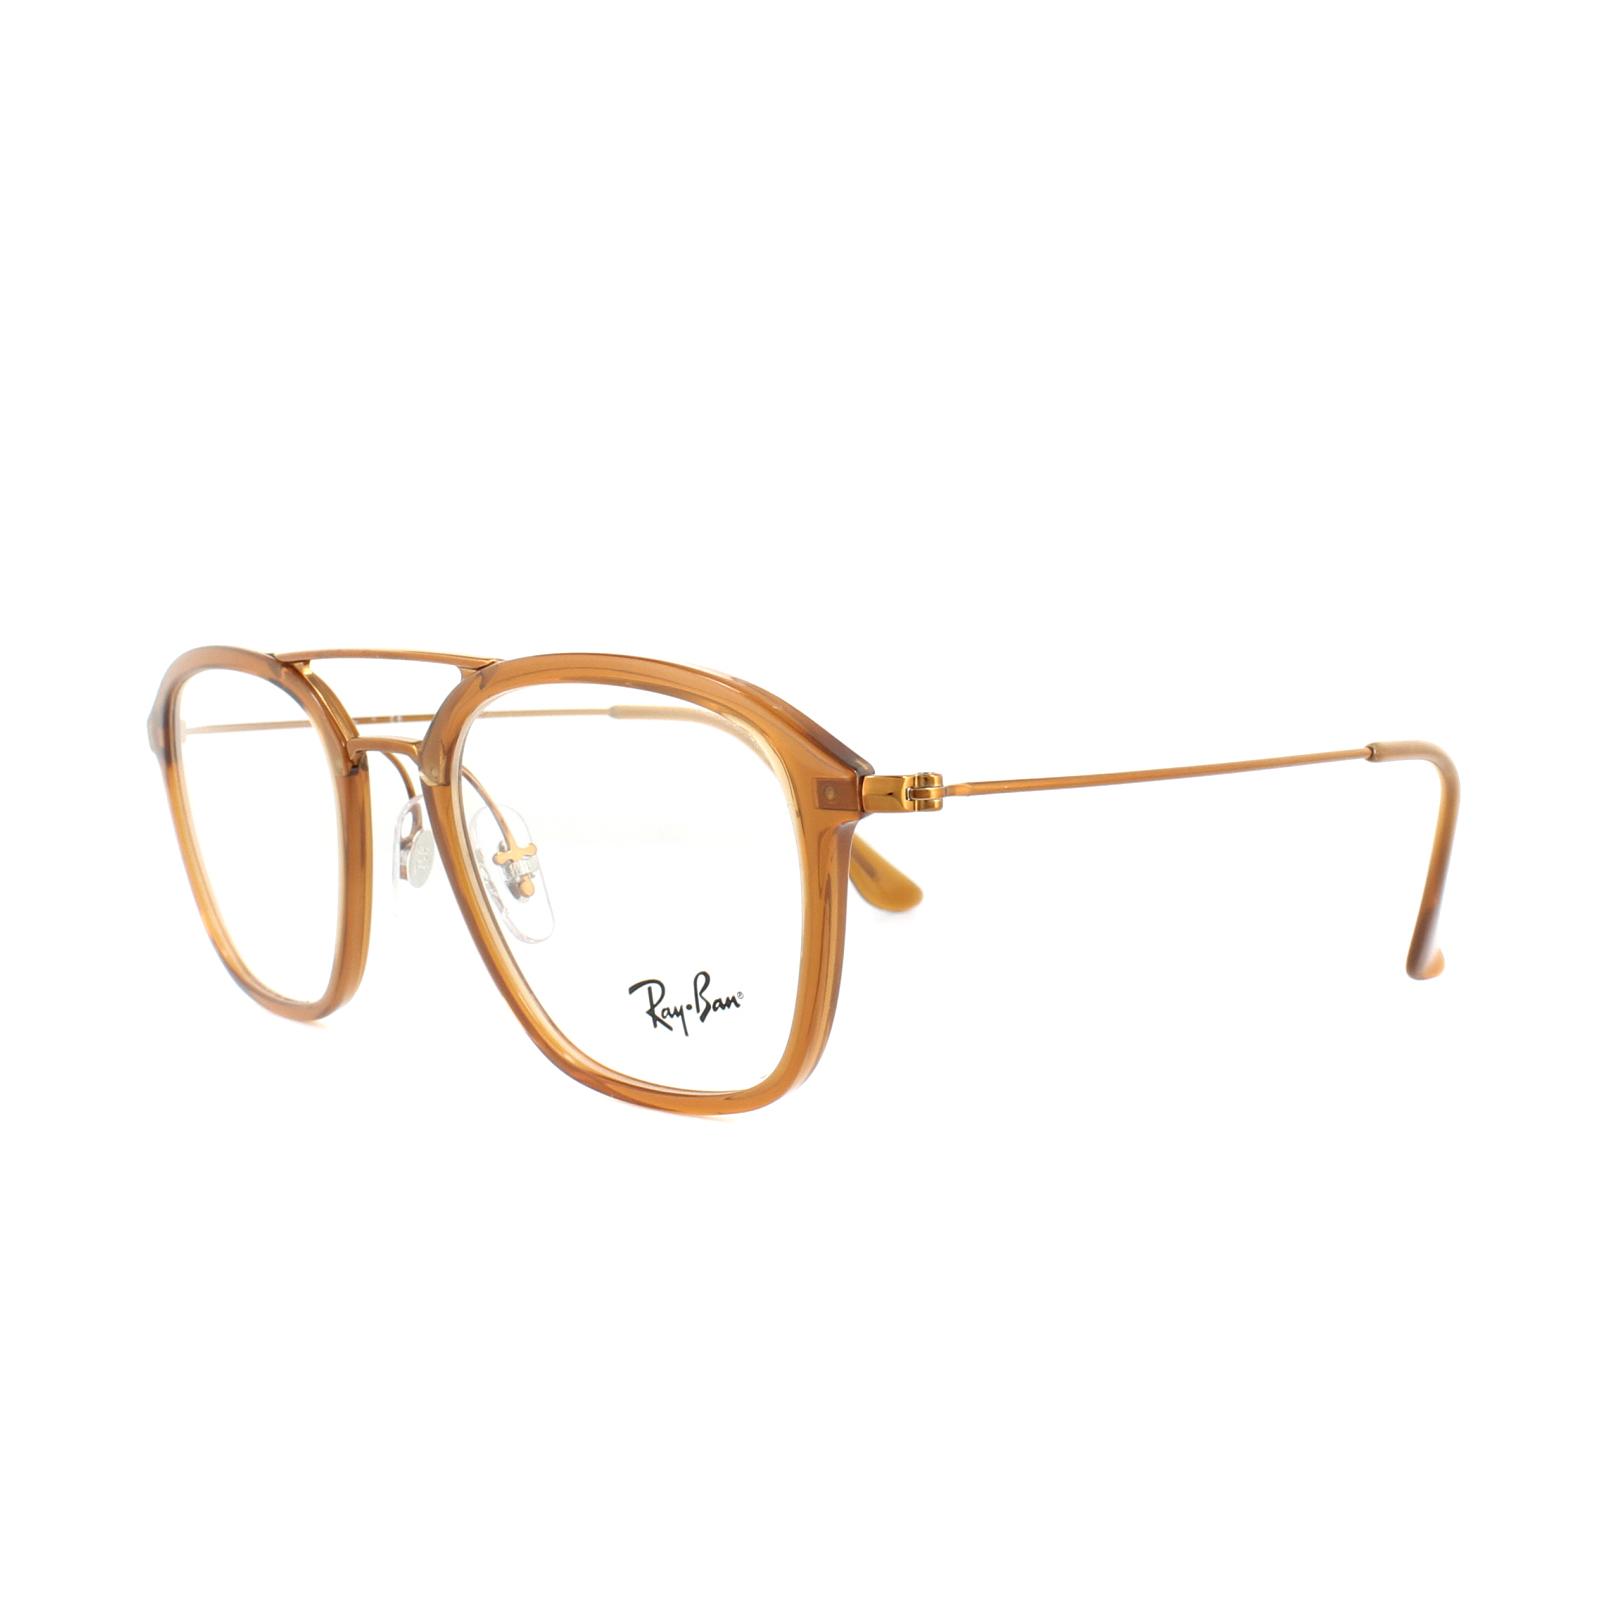 93da8abd4c Ray-Ban Glasses Frames RX 7098 5634 Brown Mens 50mm 8053672603798